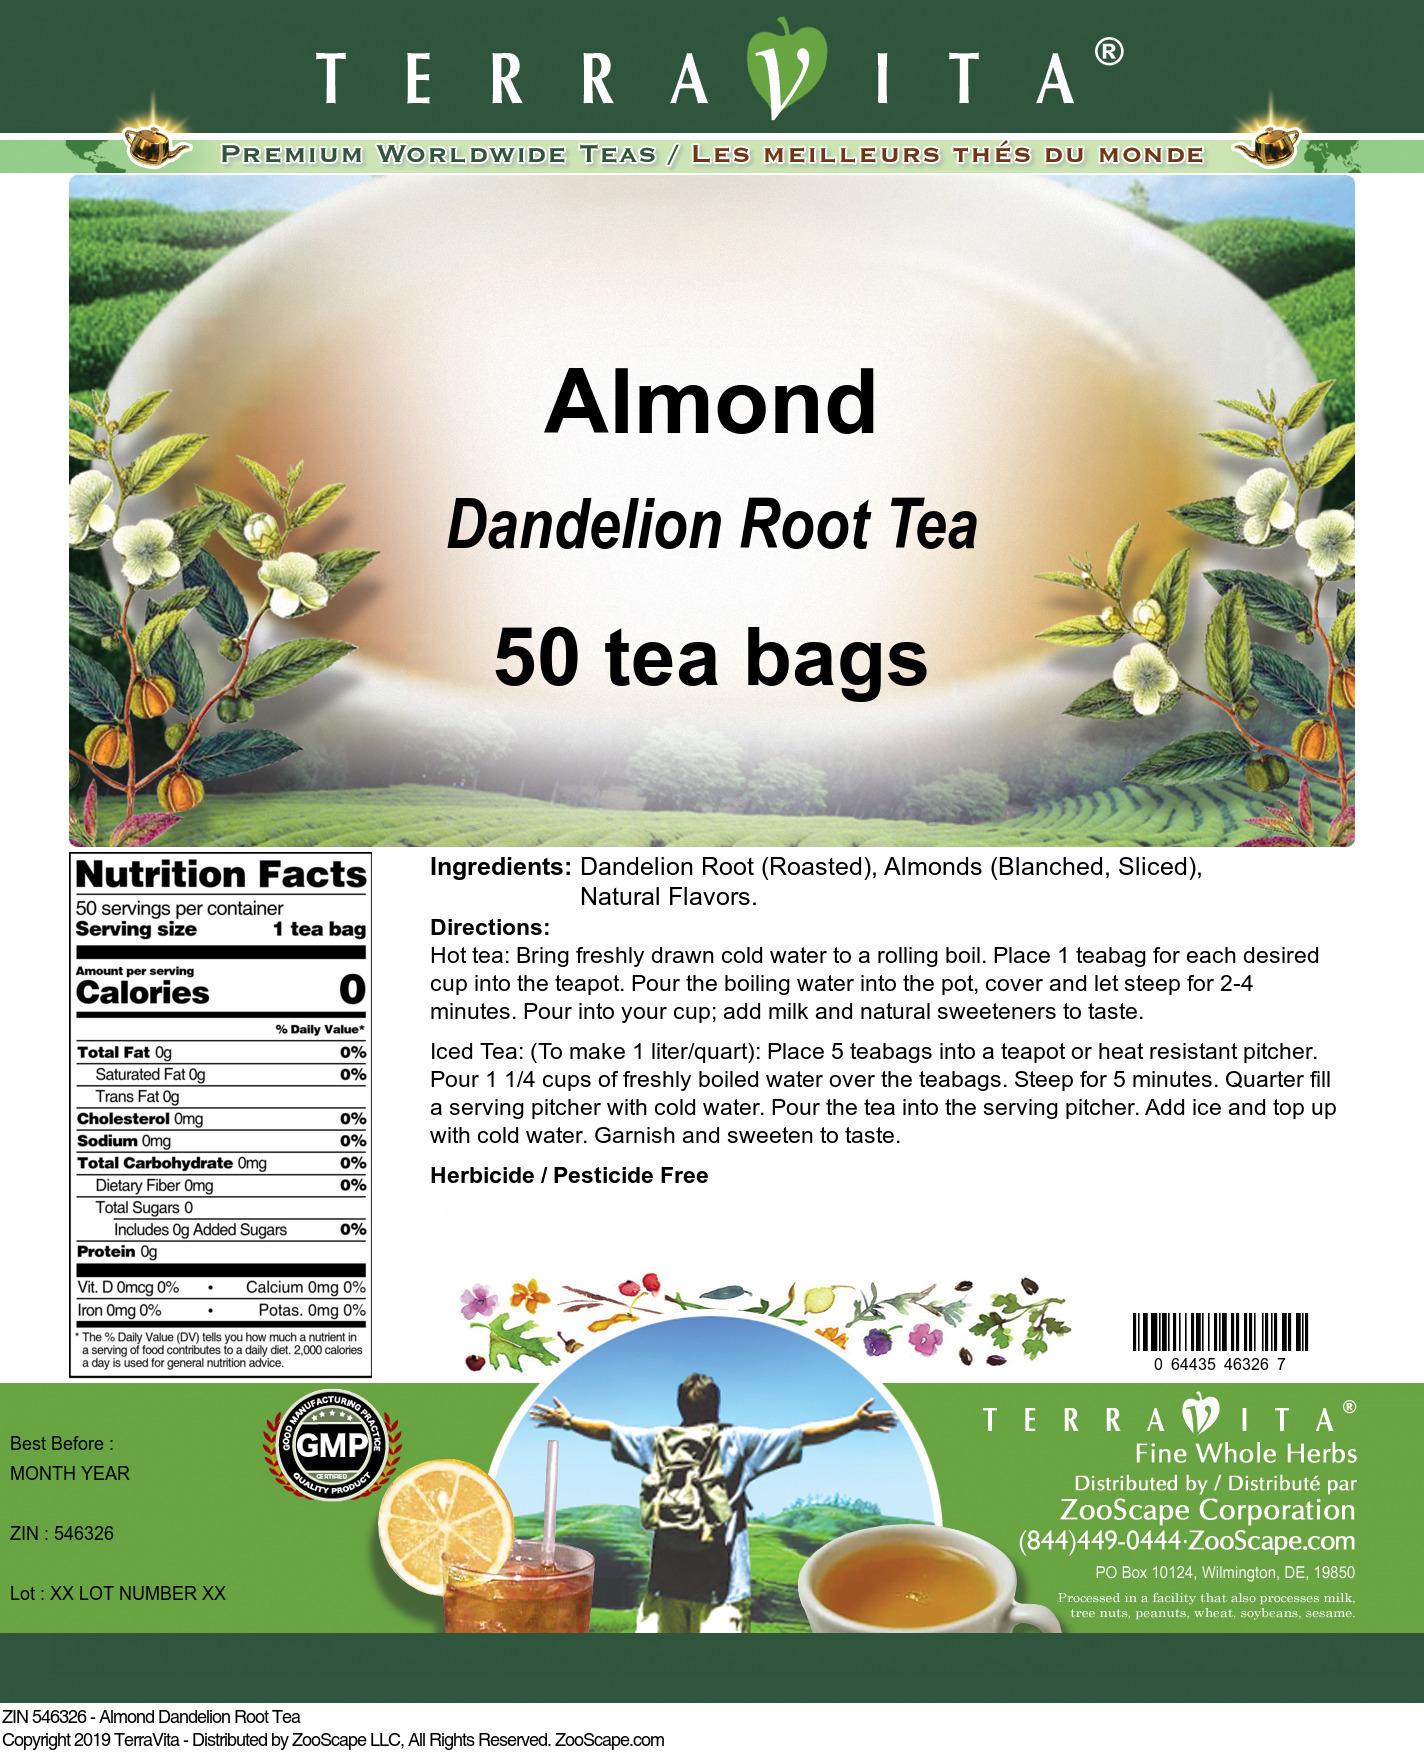 Almond Dandelion Root Tea